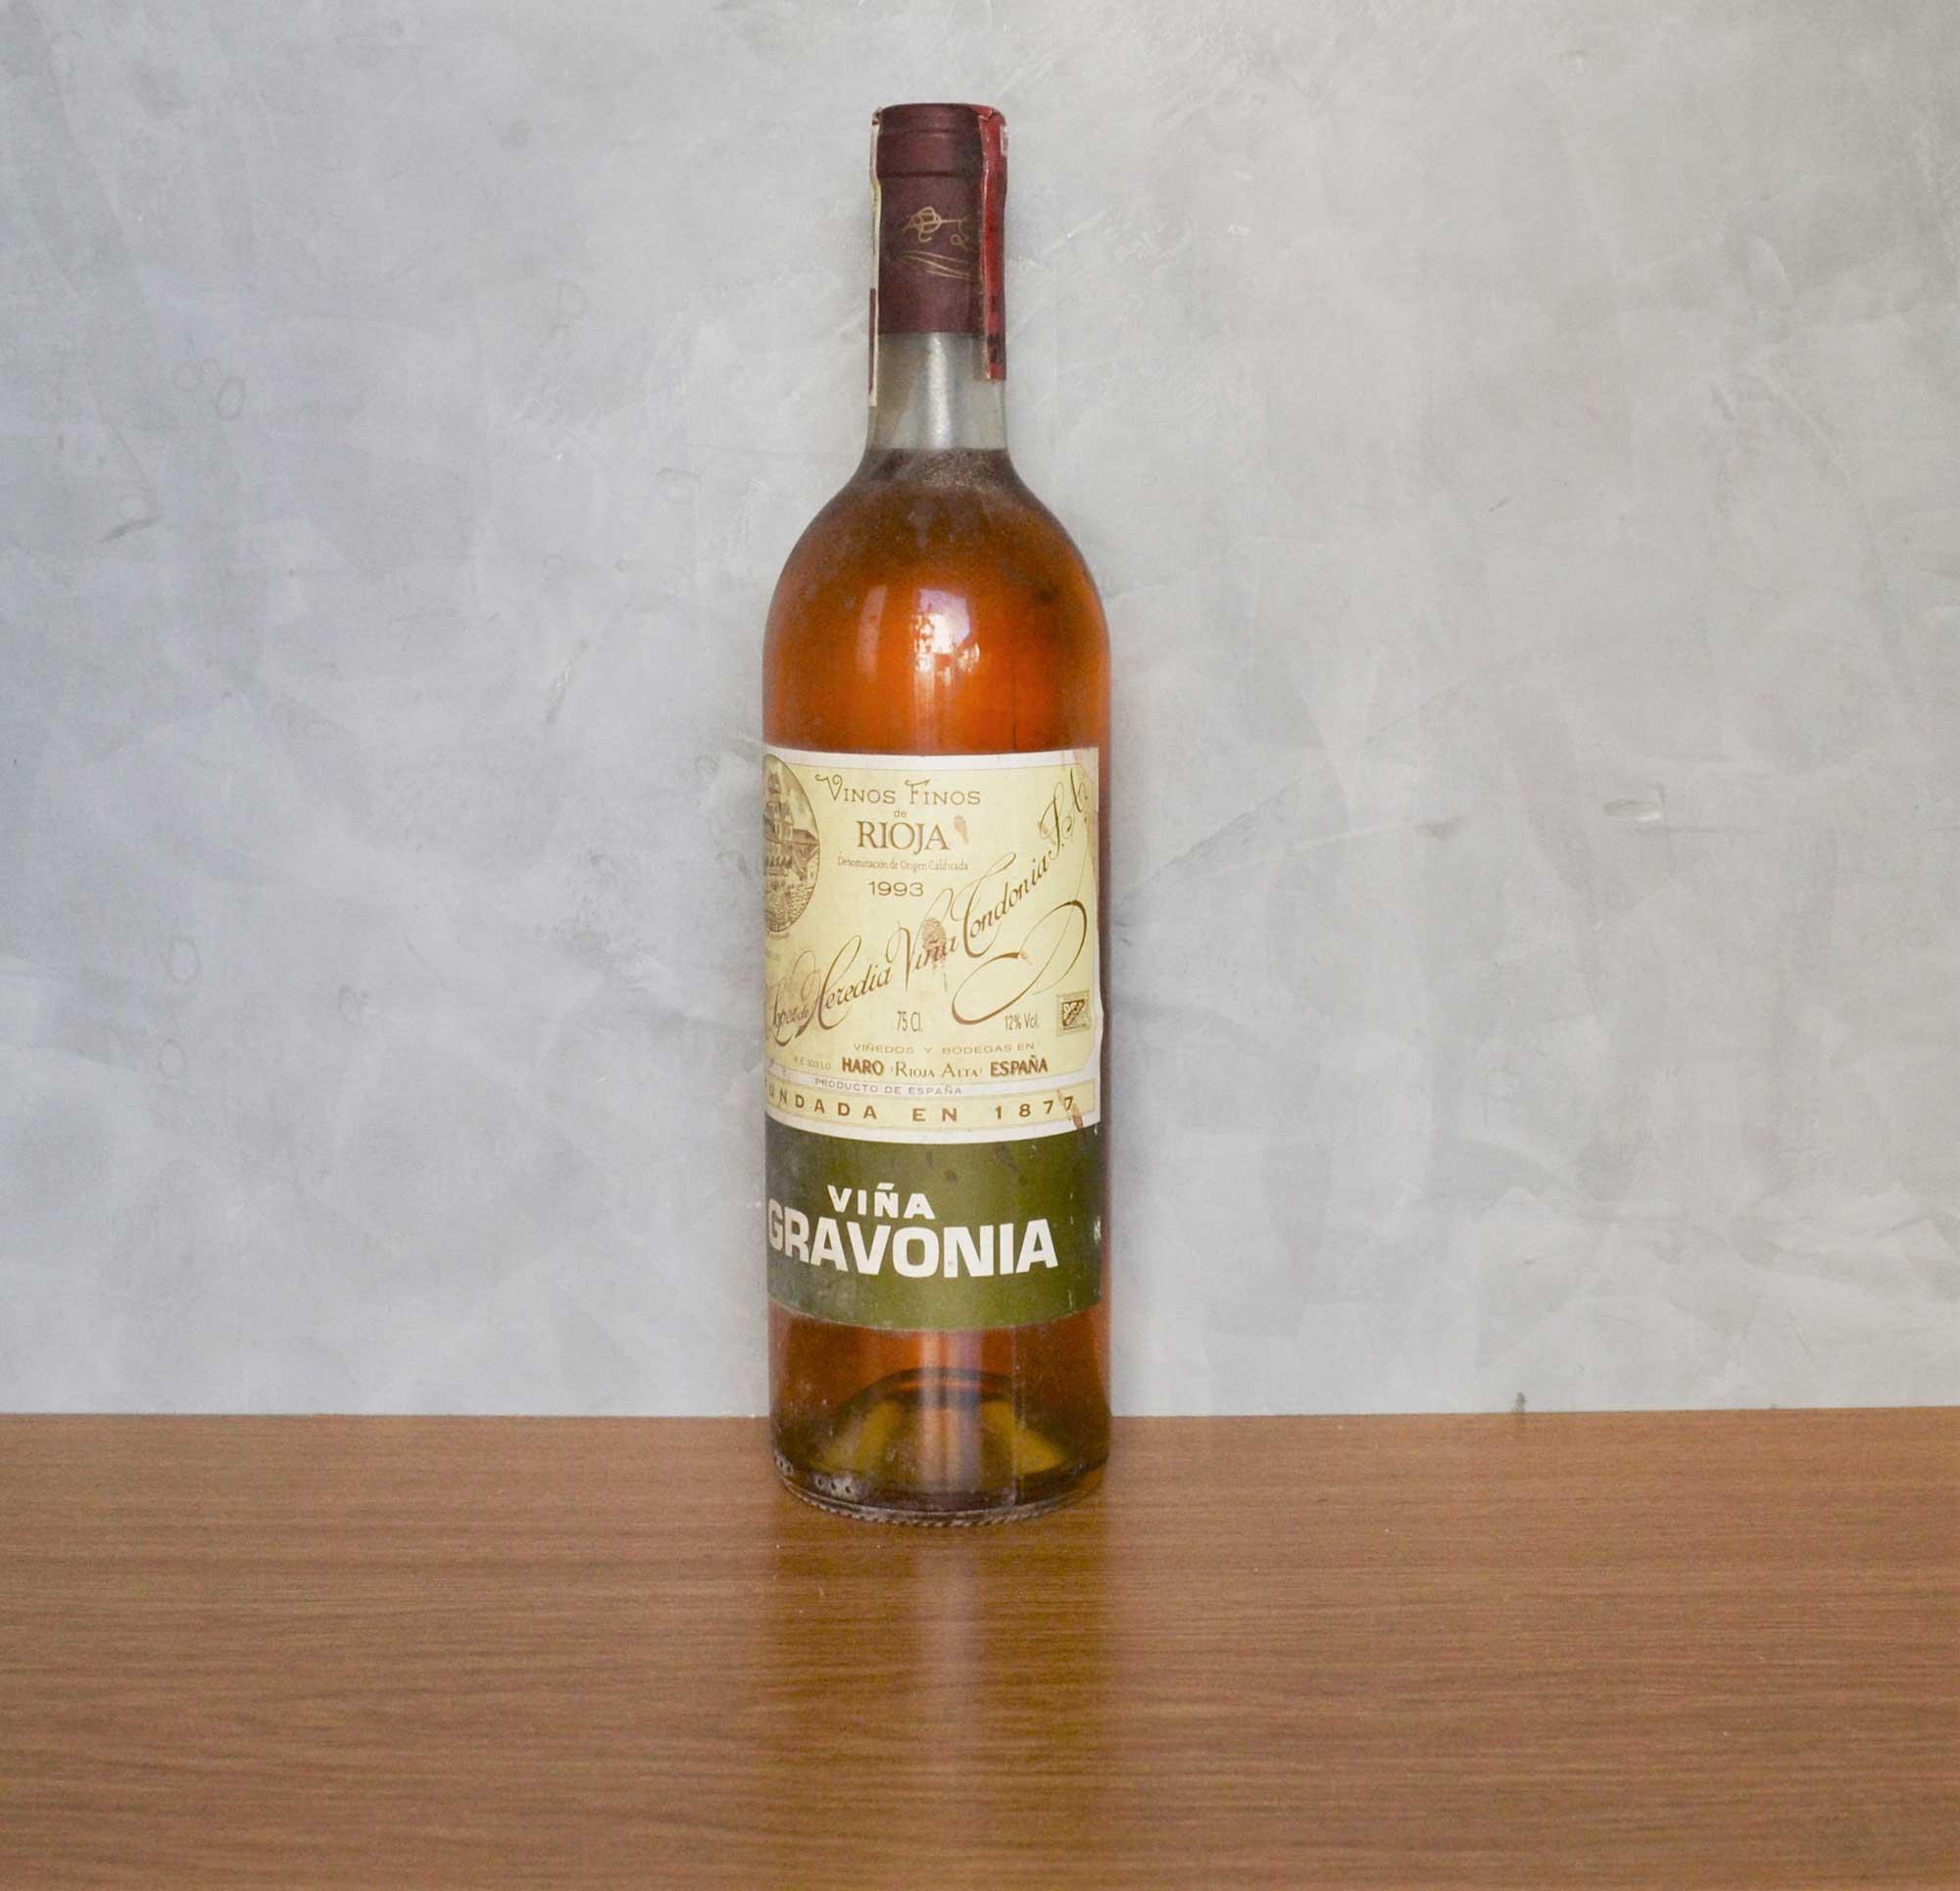 Gravonia white vineyard 1983